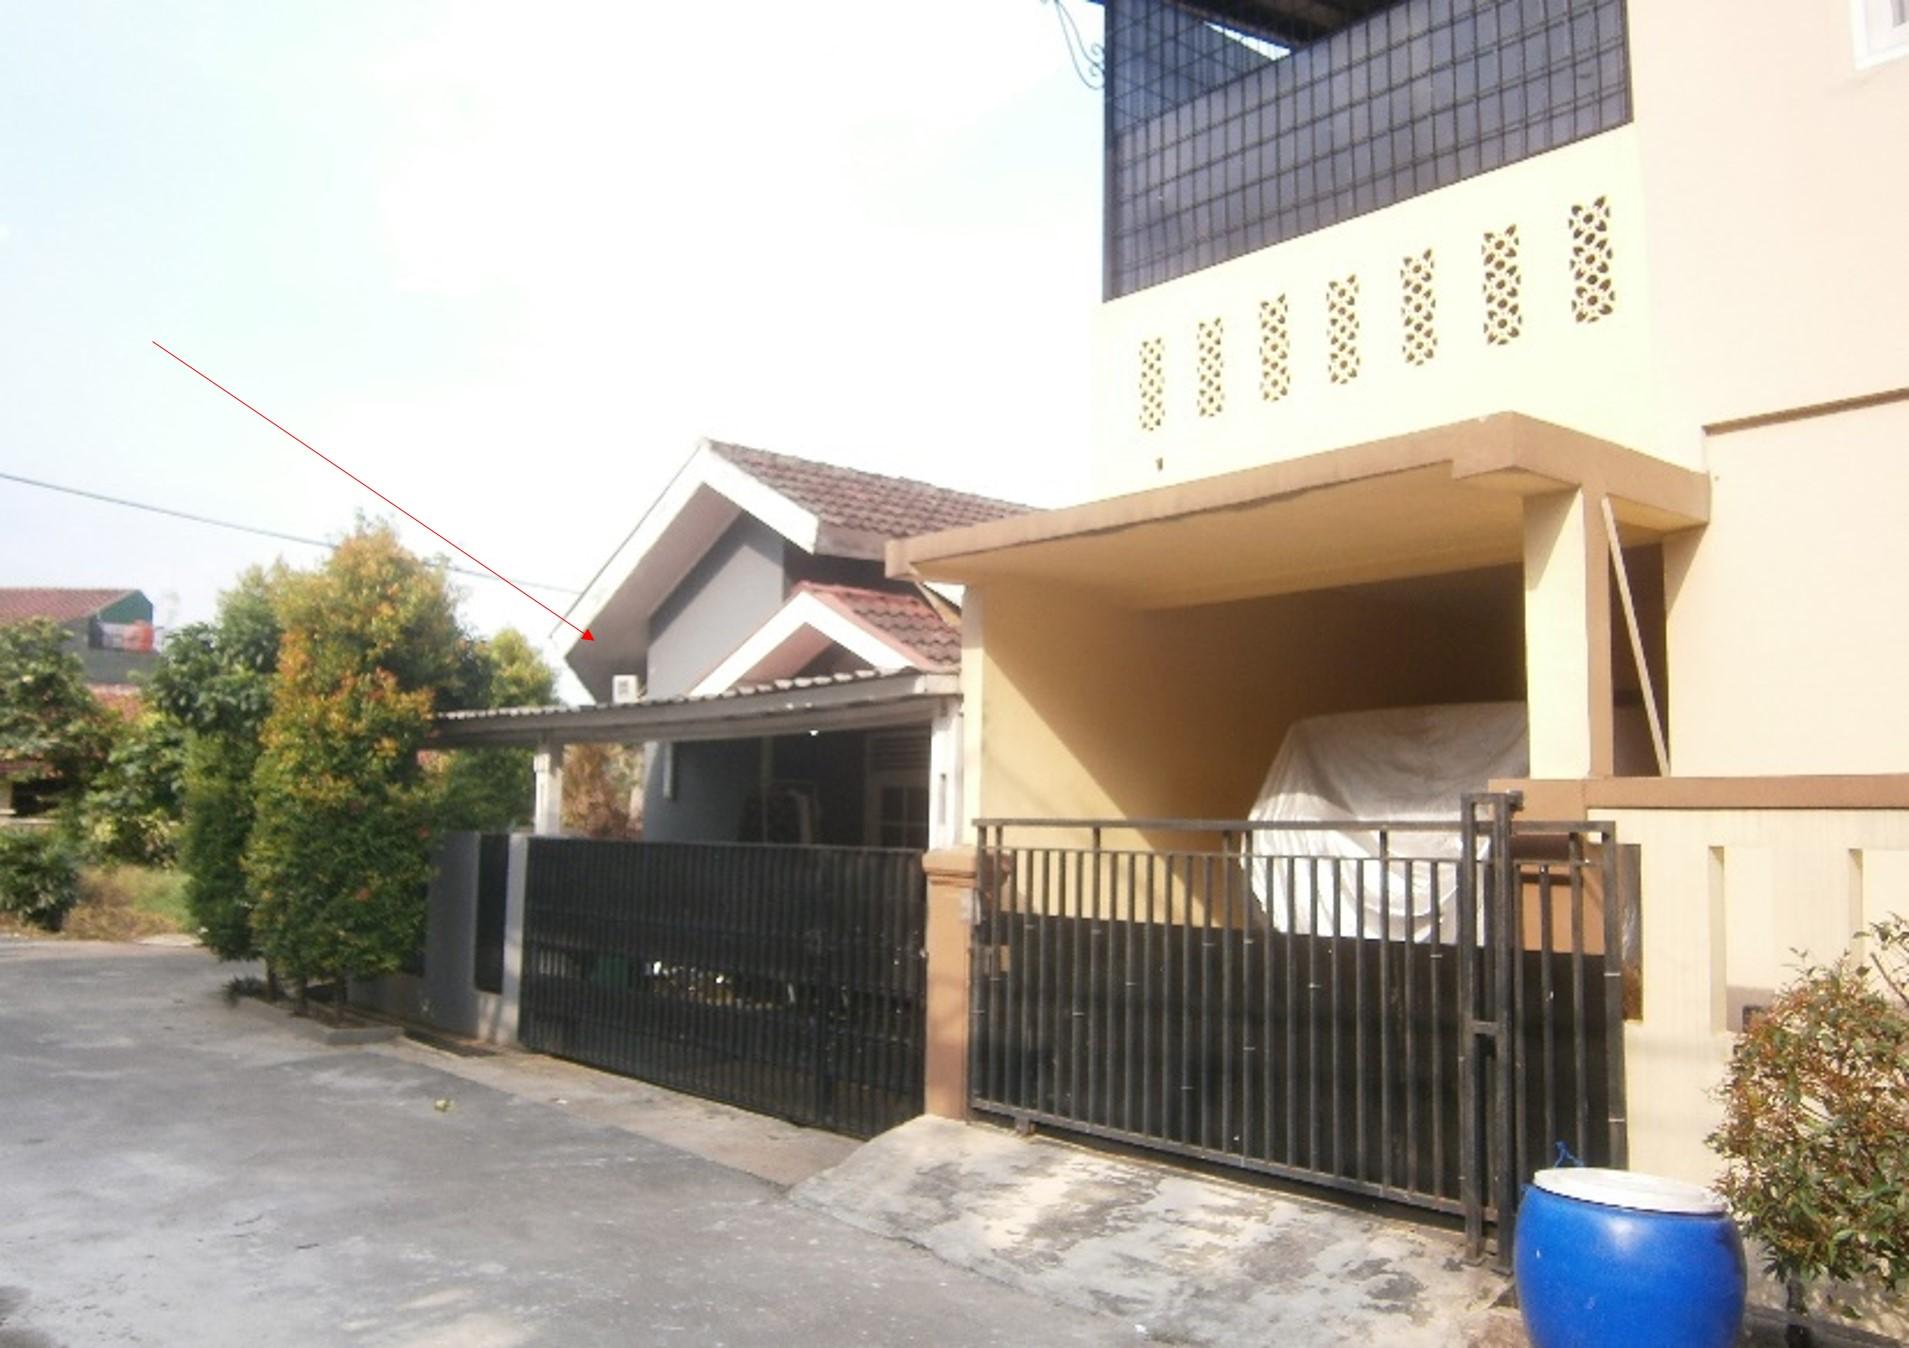 Dilelang Sebidang tanah seluas 110 M 2 berikut bangunan (Rumah Tinggal) di Pamulang